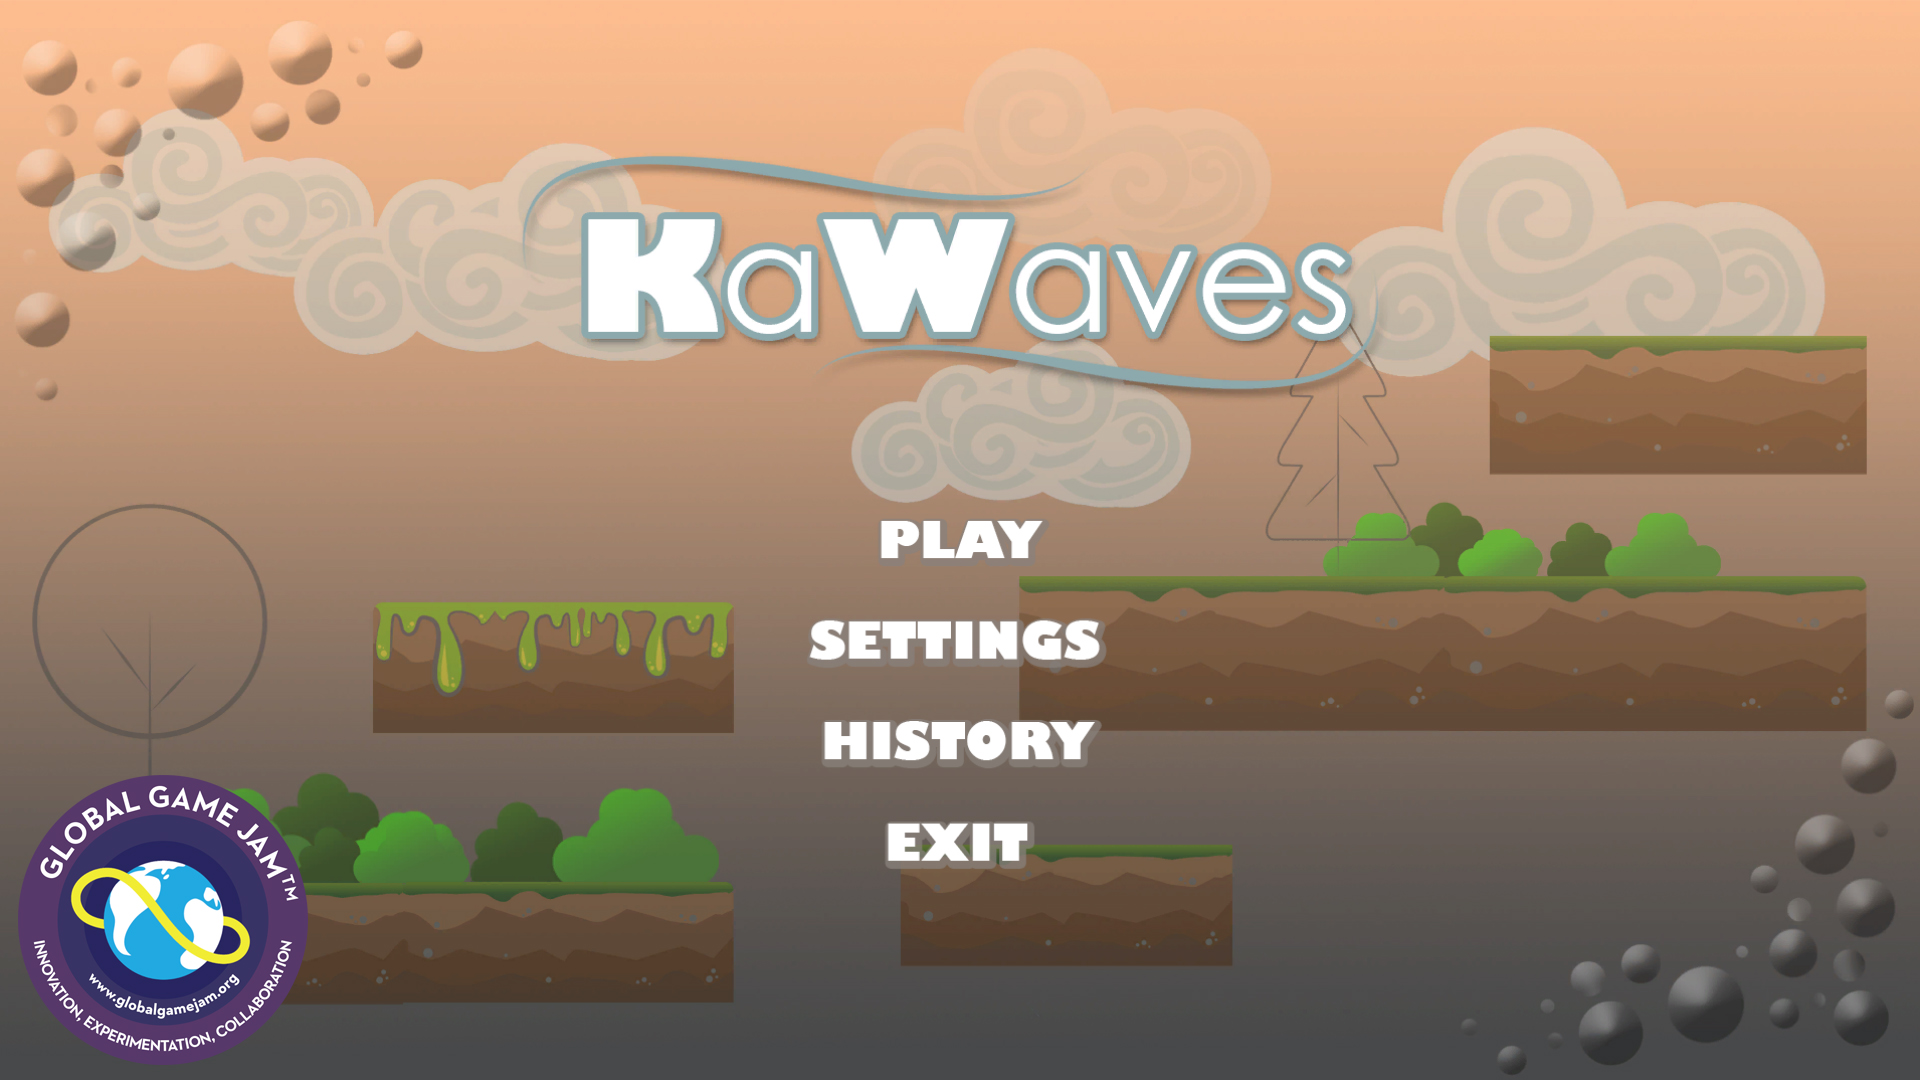 KaWaves